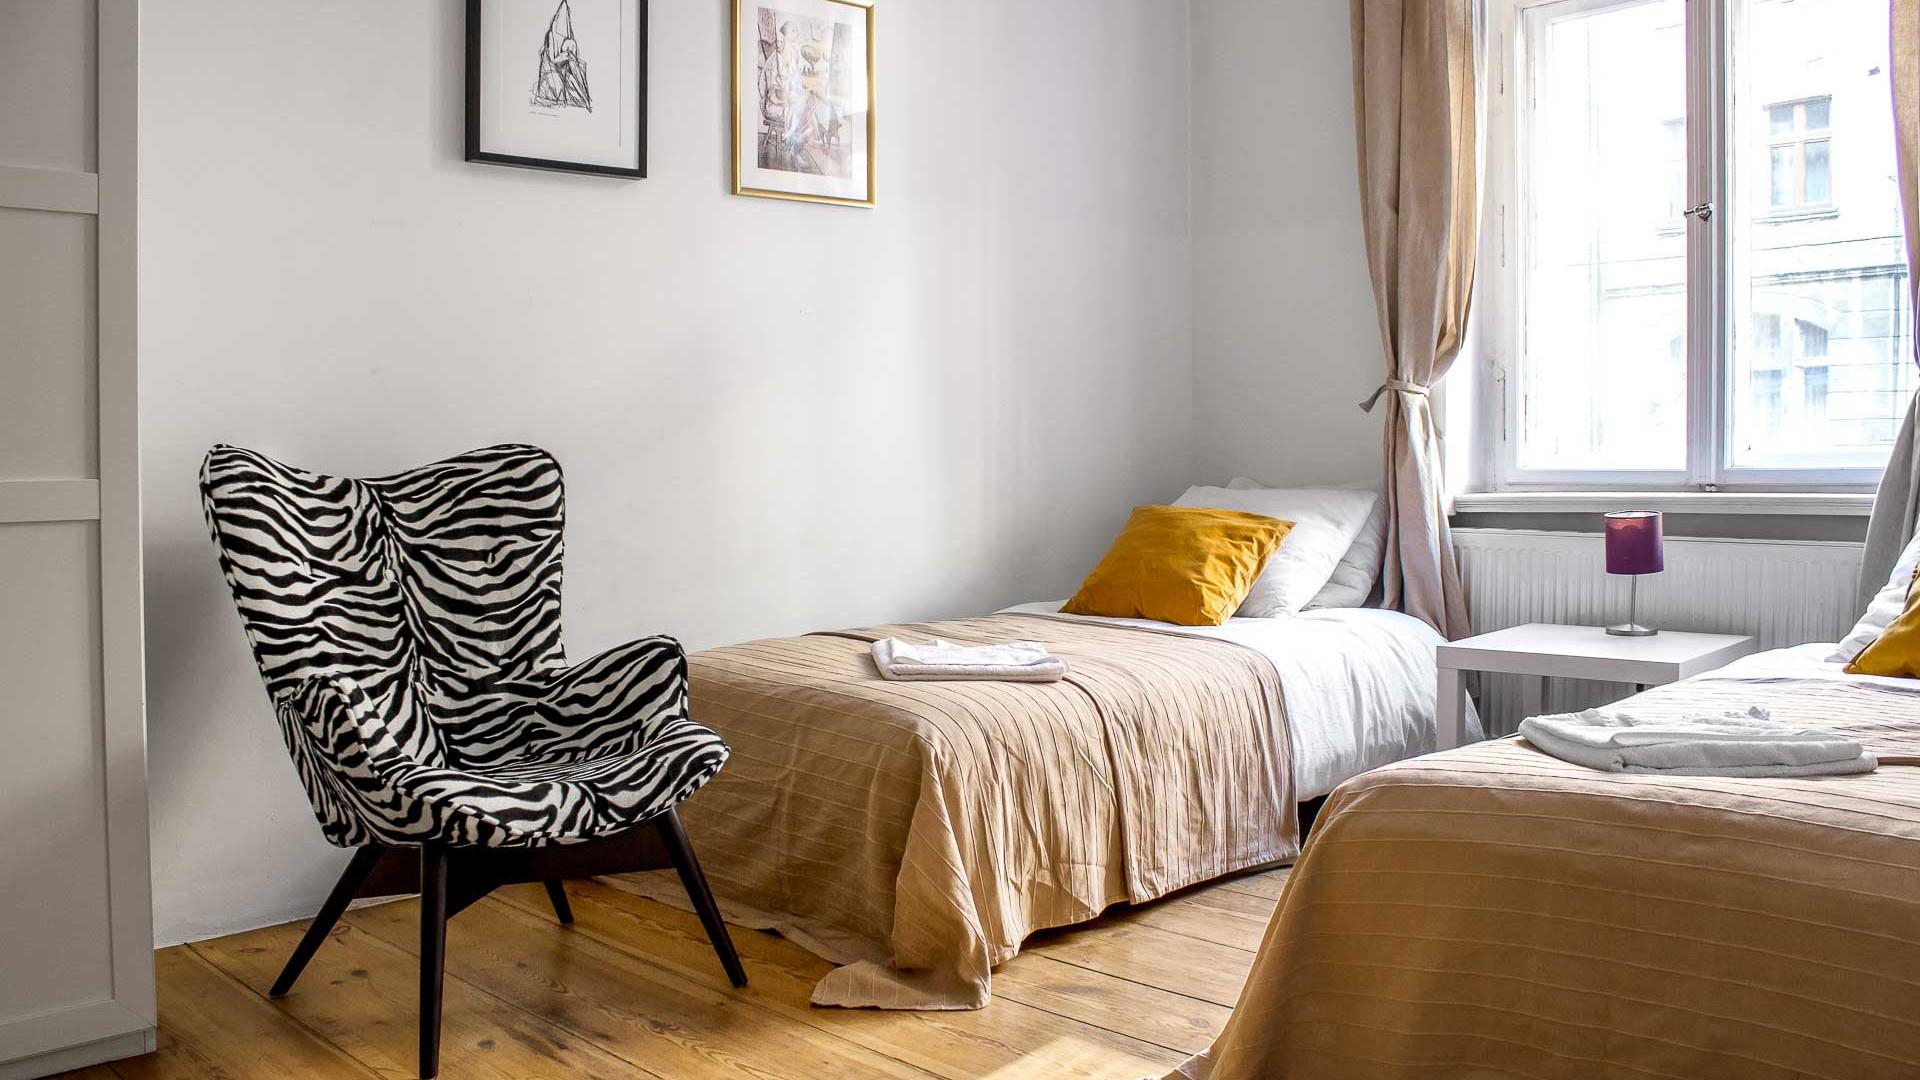 Apartment 6 7 8 osob Poznan Old Town (8